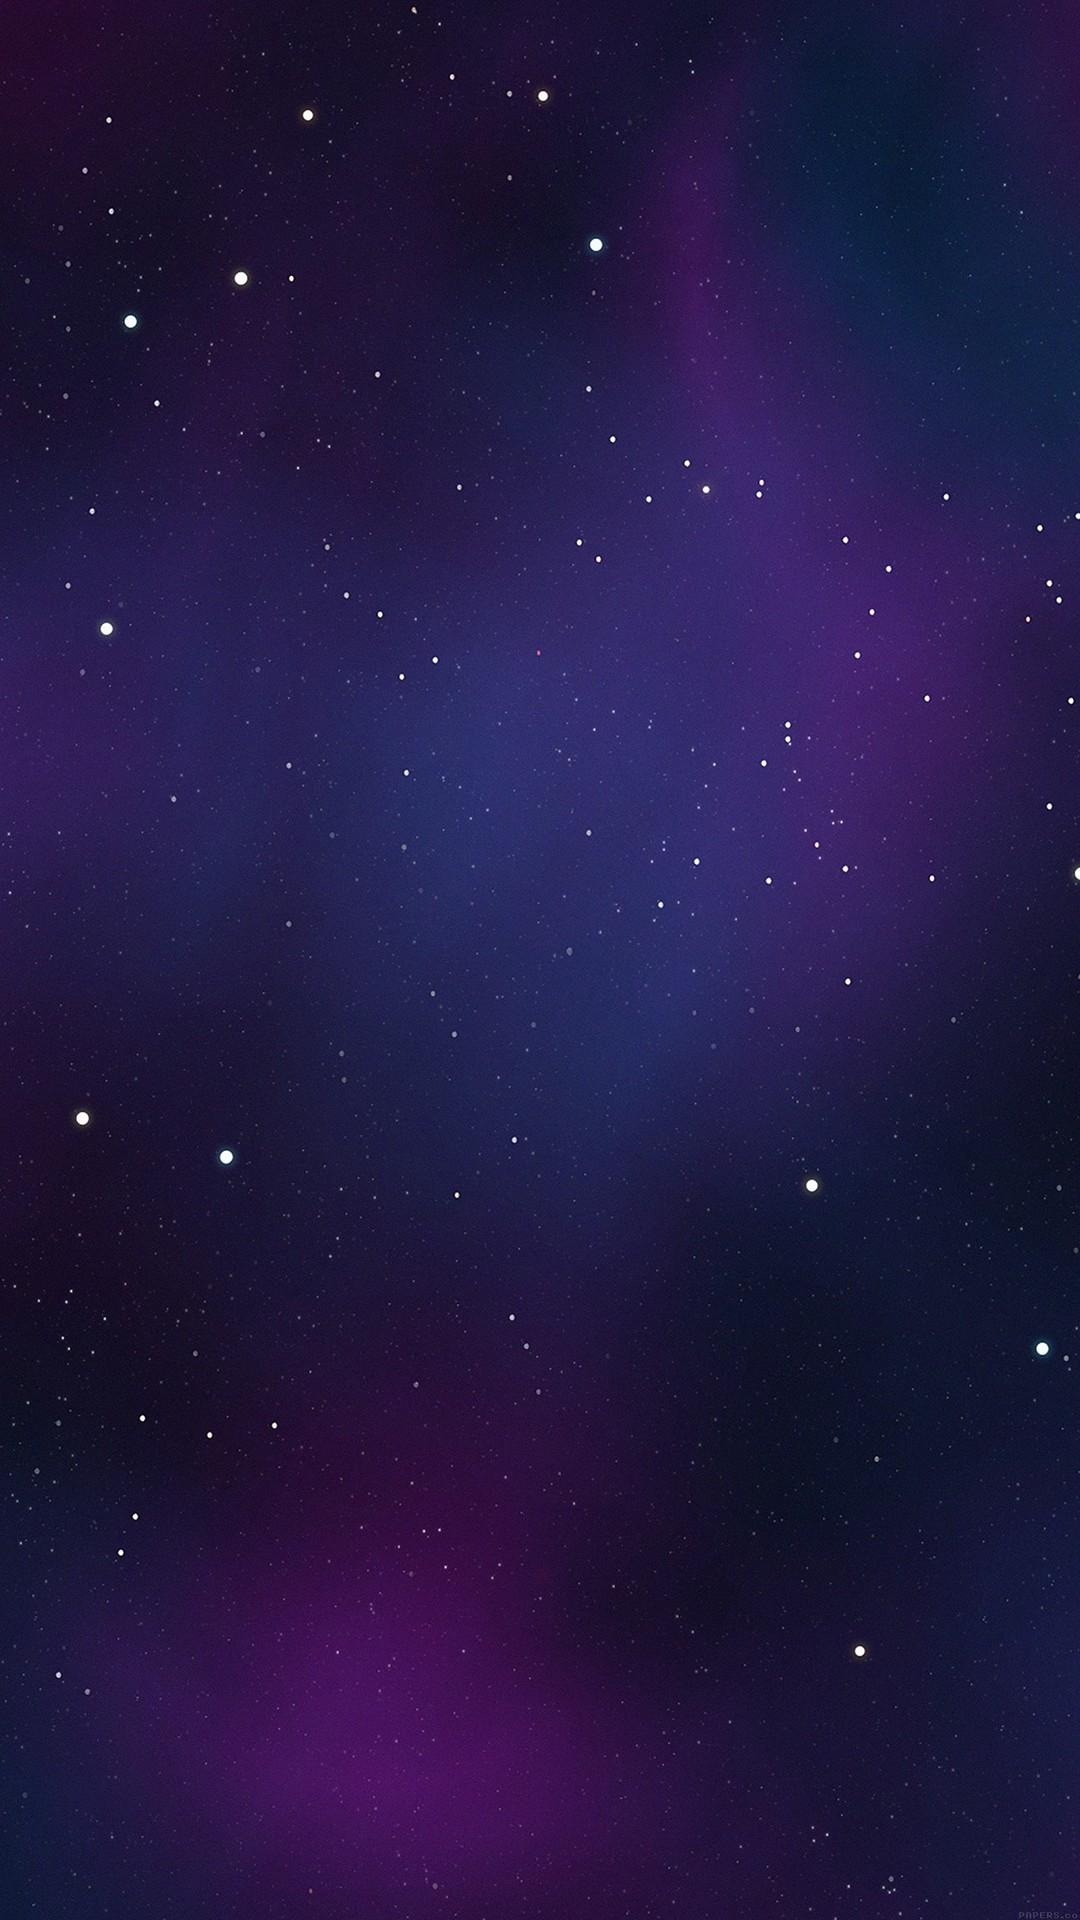 Purple Iphone Wallpaper 74e7f3af6a06072b0a385af7bcd64386 Purple Iphone  Wallpaper Briar Rose Space Purple Art iphone 6 wallpaper ilikewallpaper_com  …